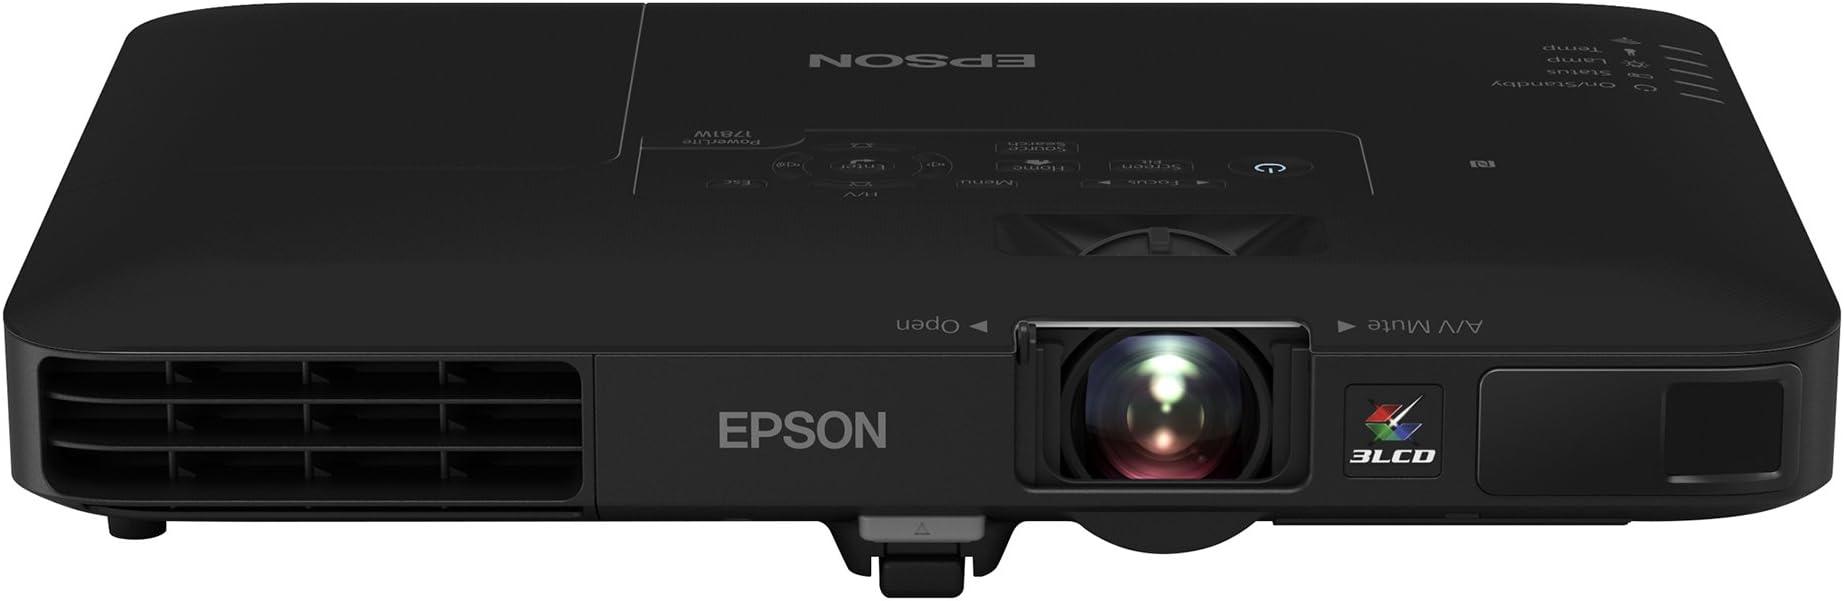 Epson PowerLite 1781W WXGA, 3,200 lumens color brightness (color light output), 3,200 lumens white brightness wireless 3LCD Portable Projector , Black